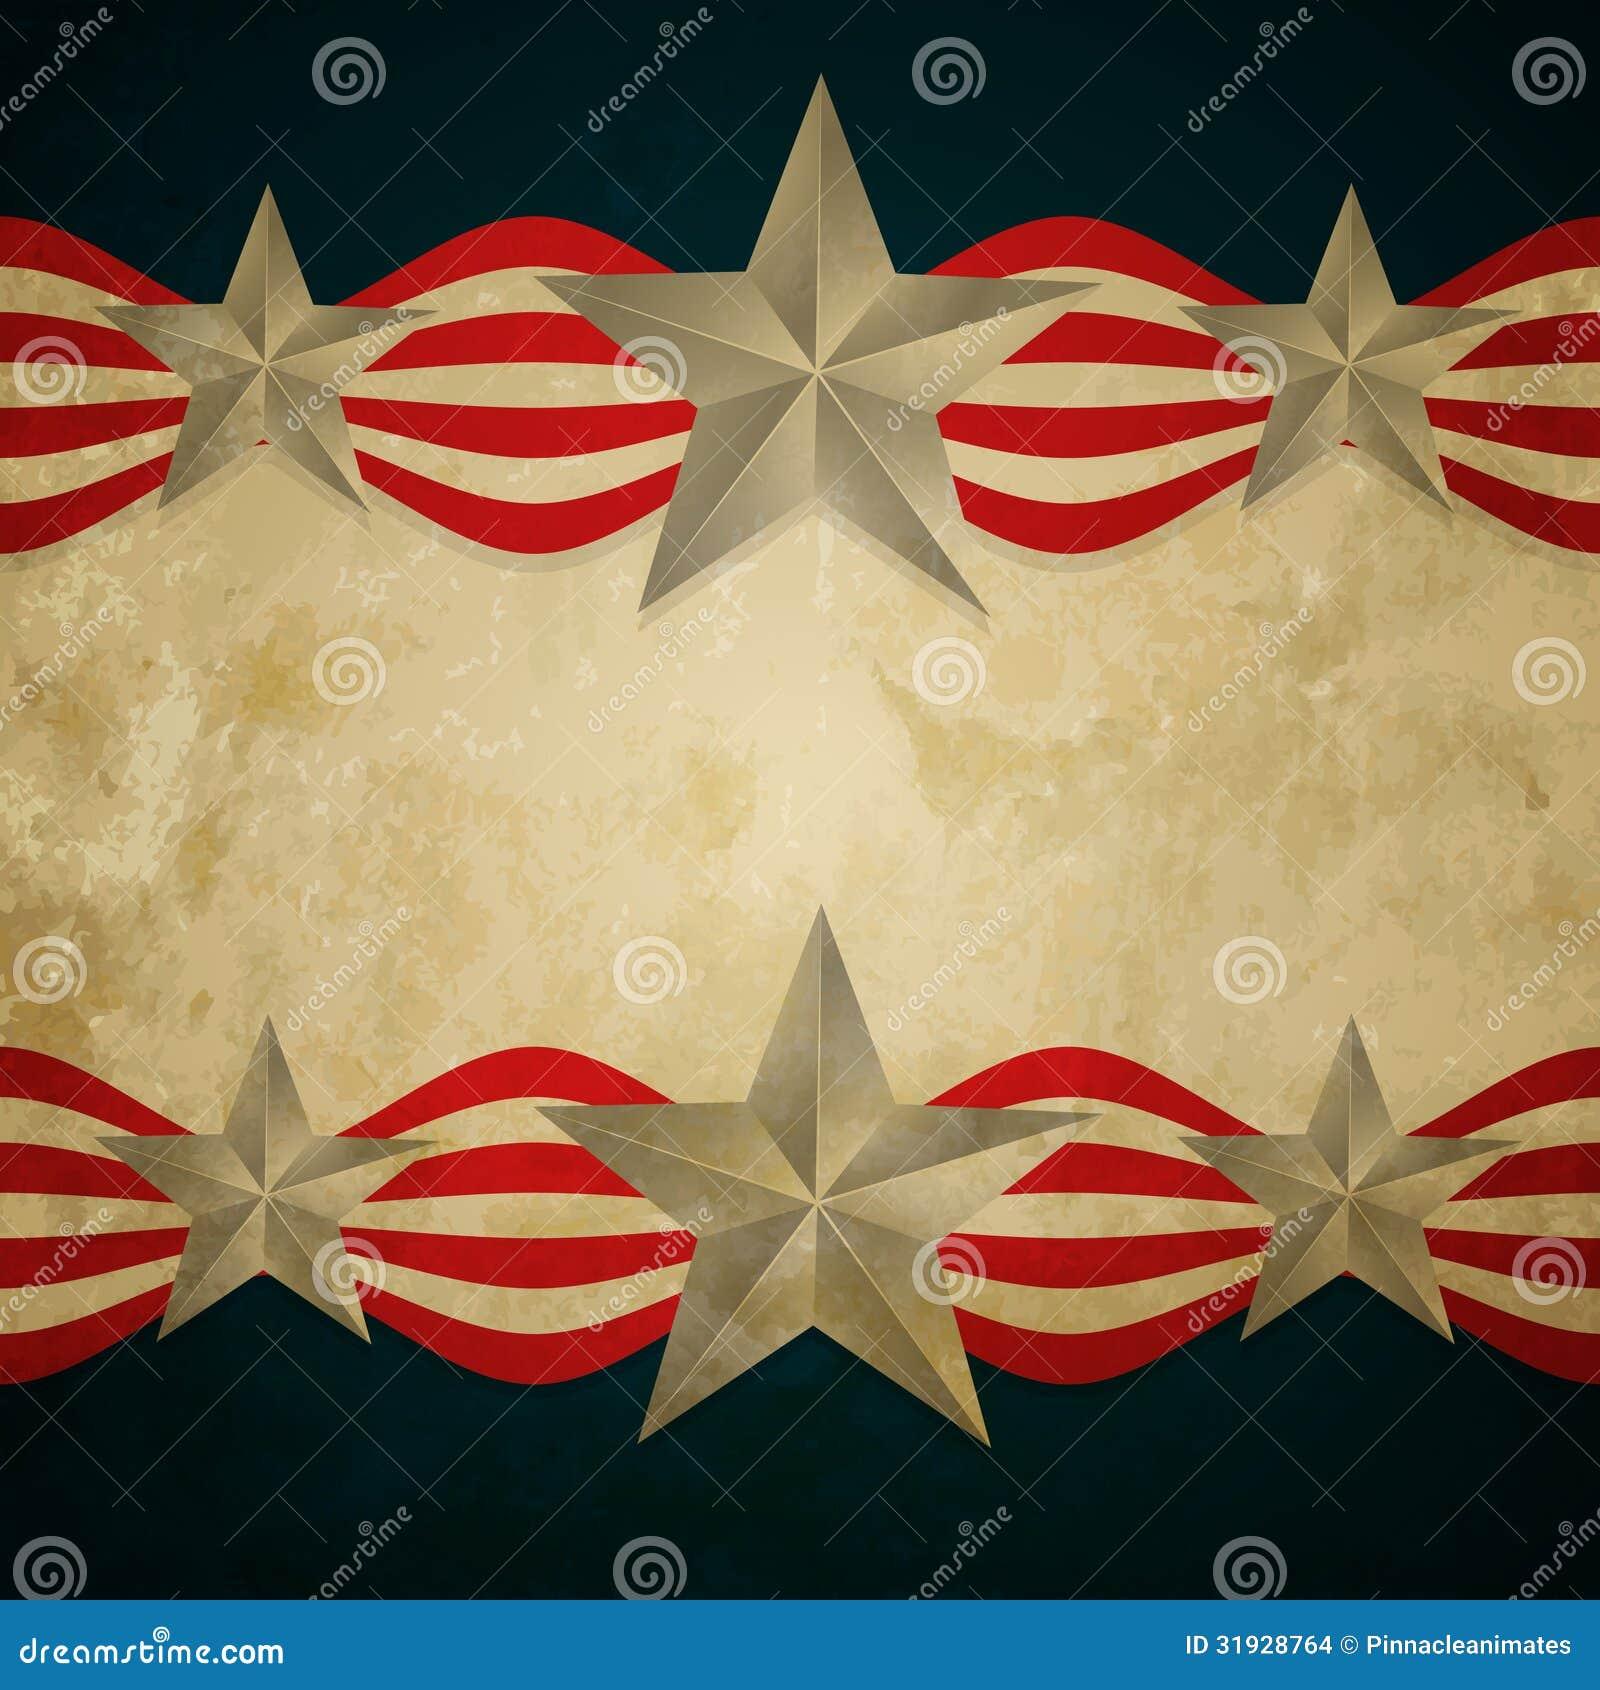 american flag vintage vector - photo #26